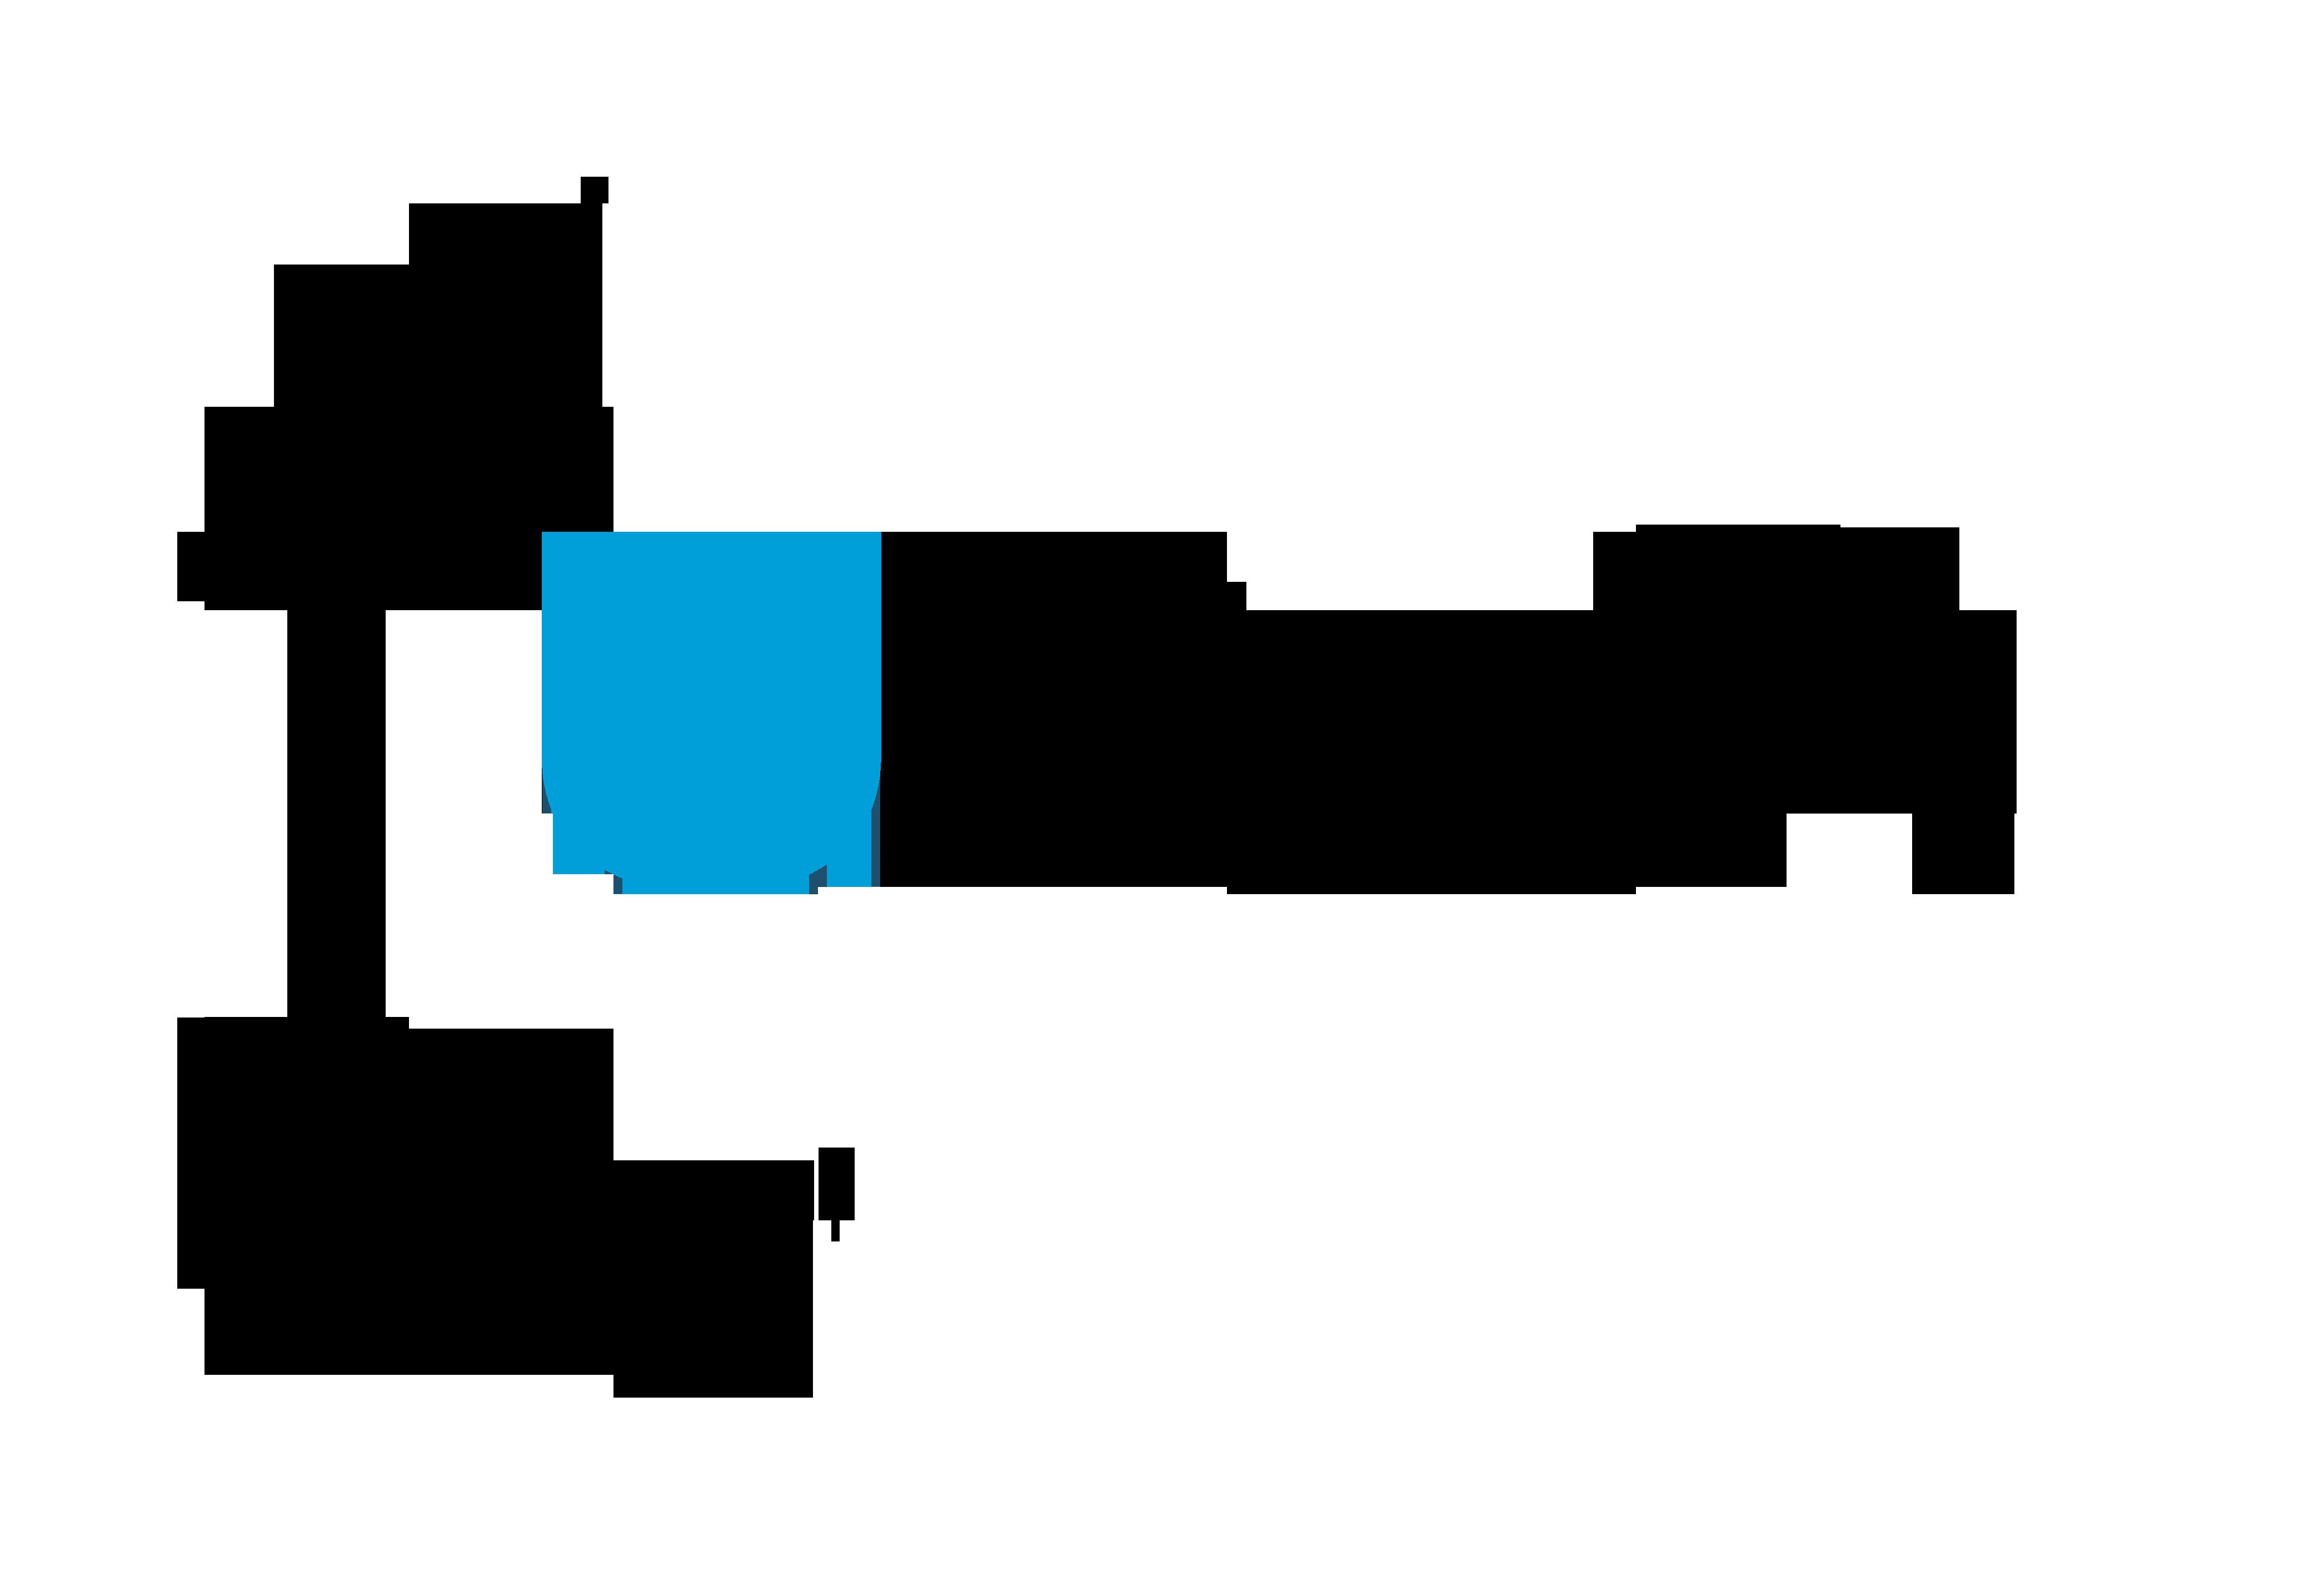 delft-university-of-technology-logo